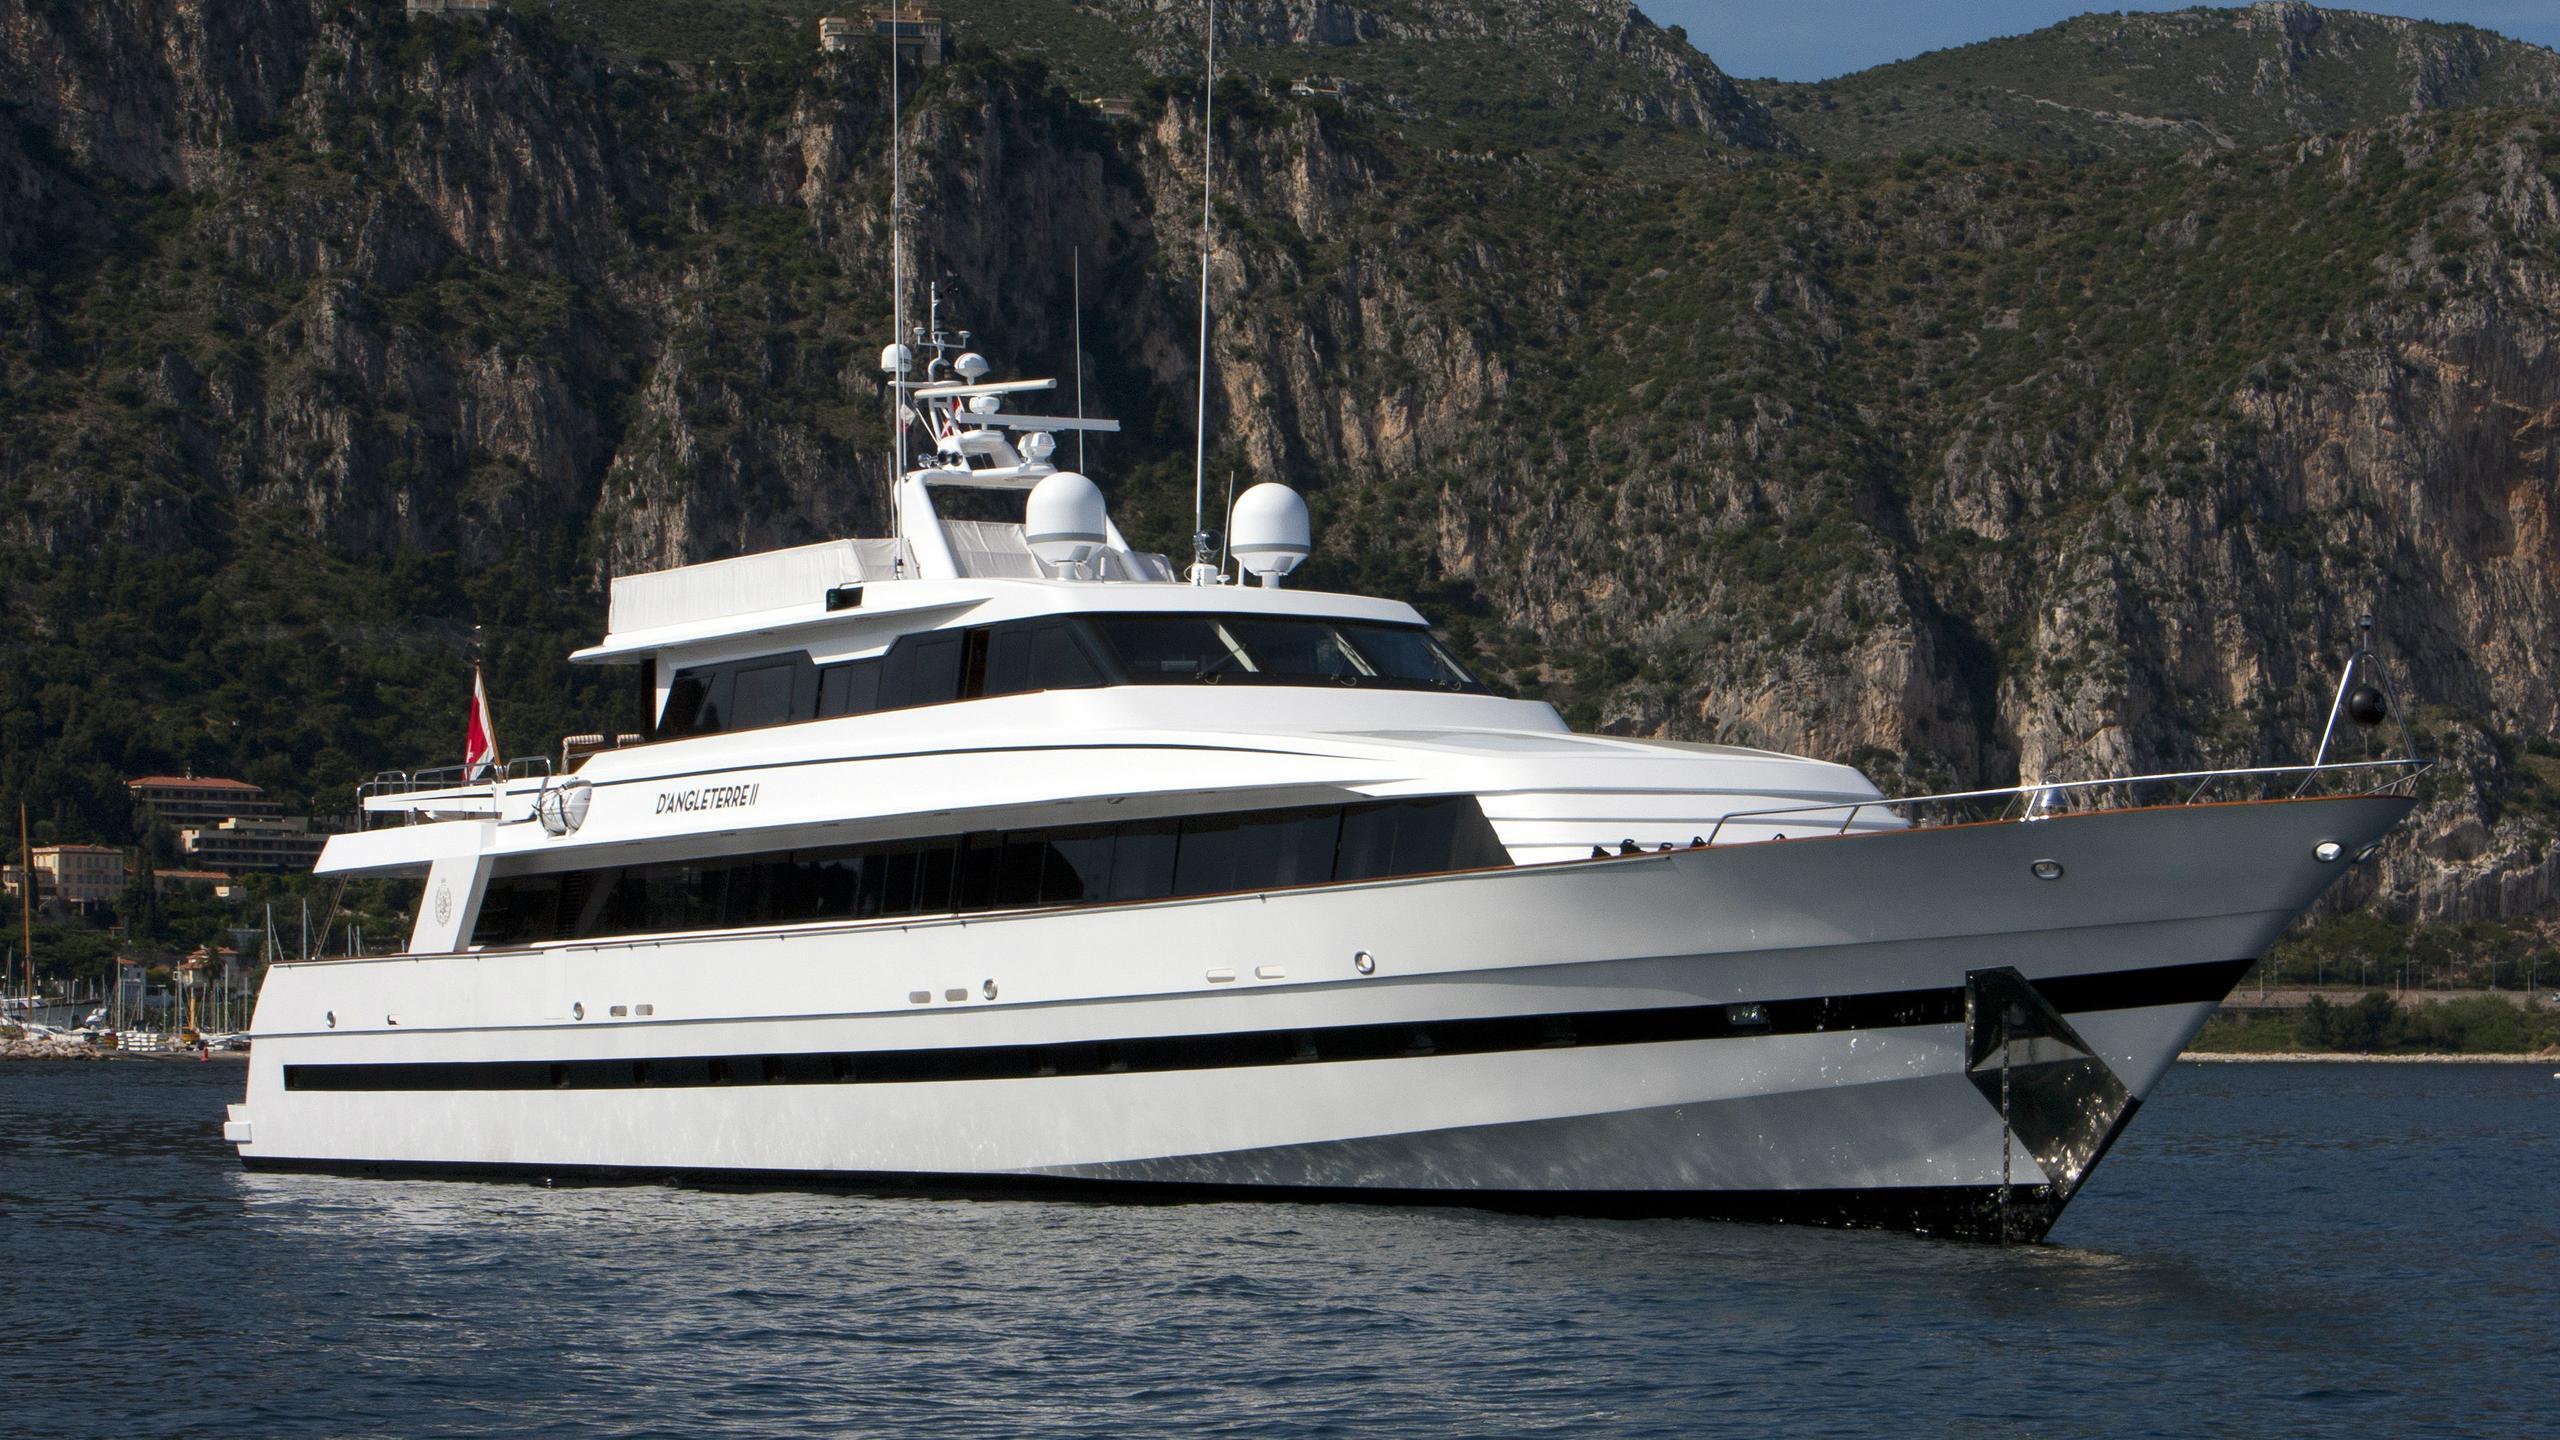 d-angleterre-ii-de-copenhague-motor-yacht-w-a-souter-son-1986-42m-bow